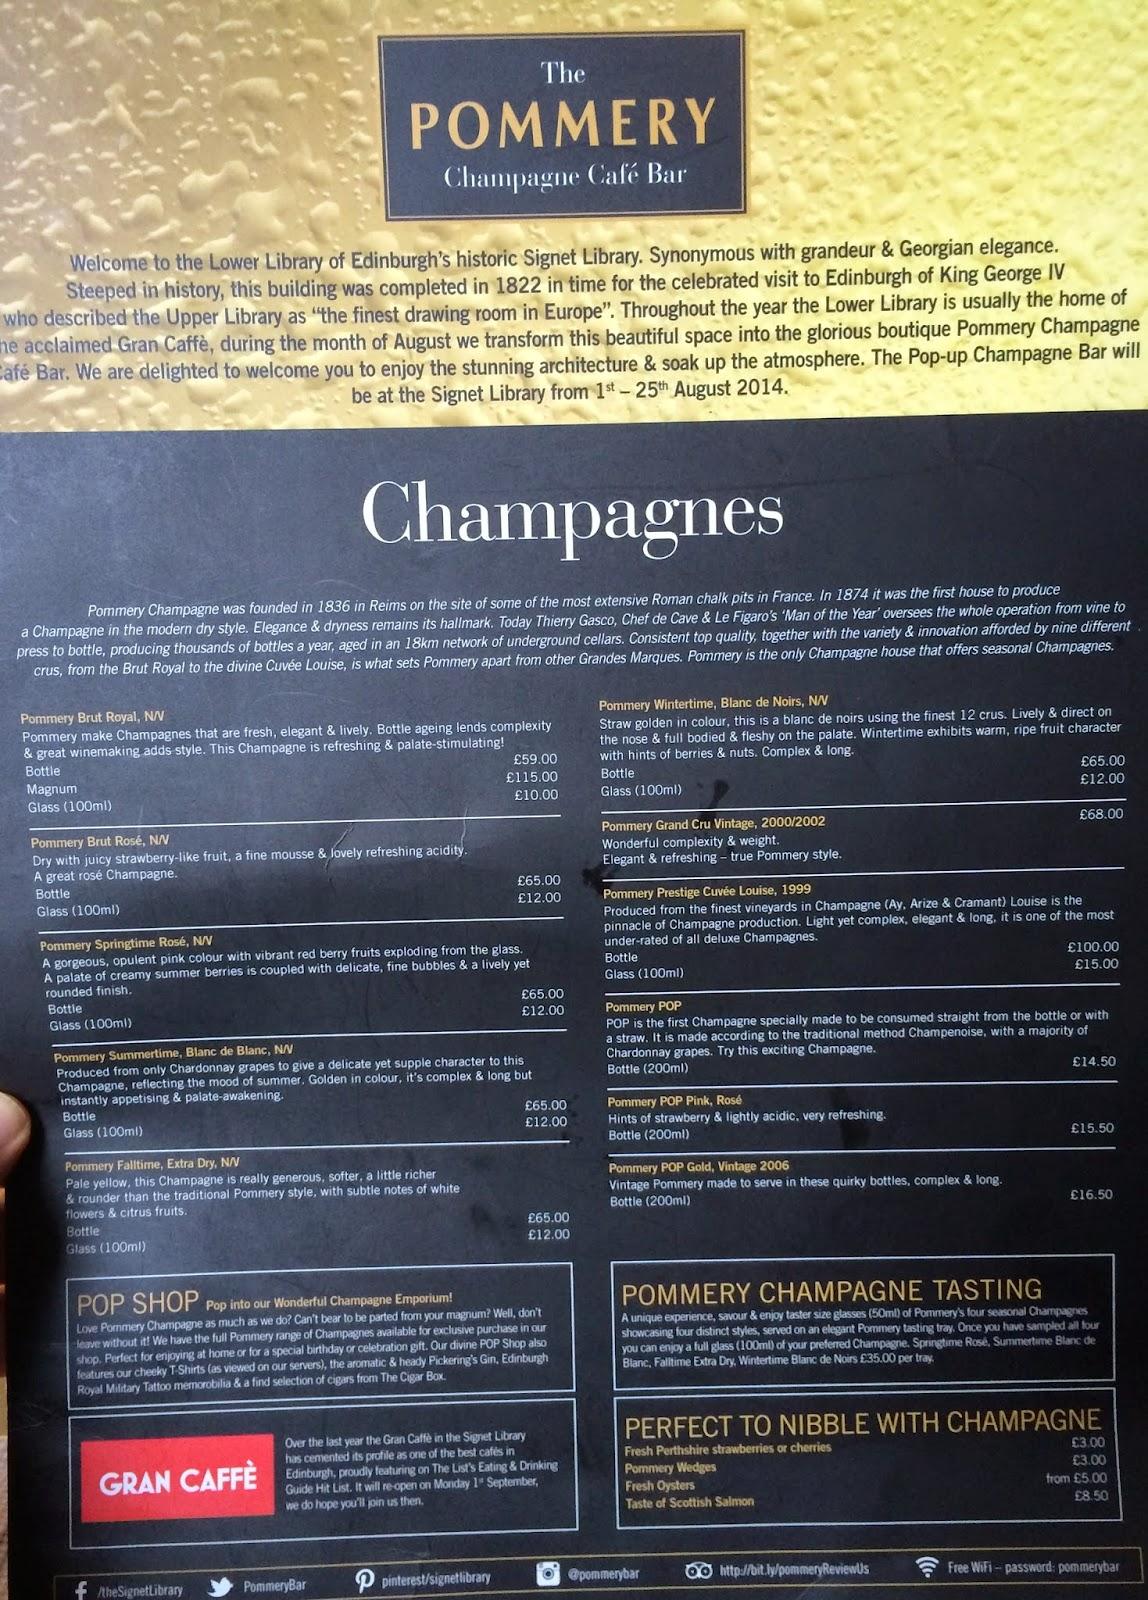 TASTE OF HAWAII: POMMERY CHAMPAGNE'S POP-UP WINE BAR IN ...